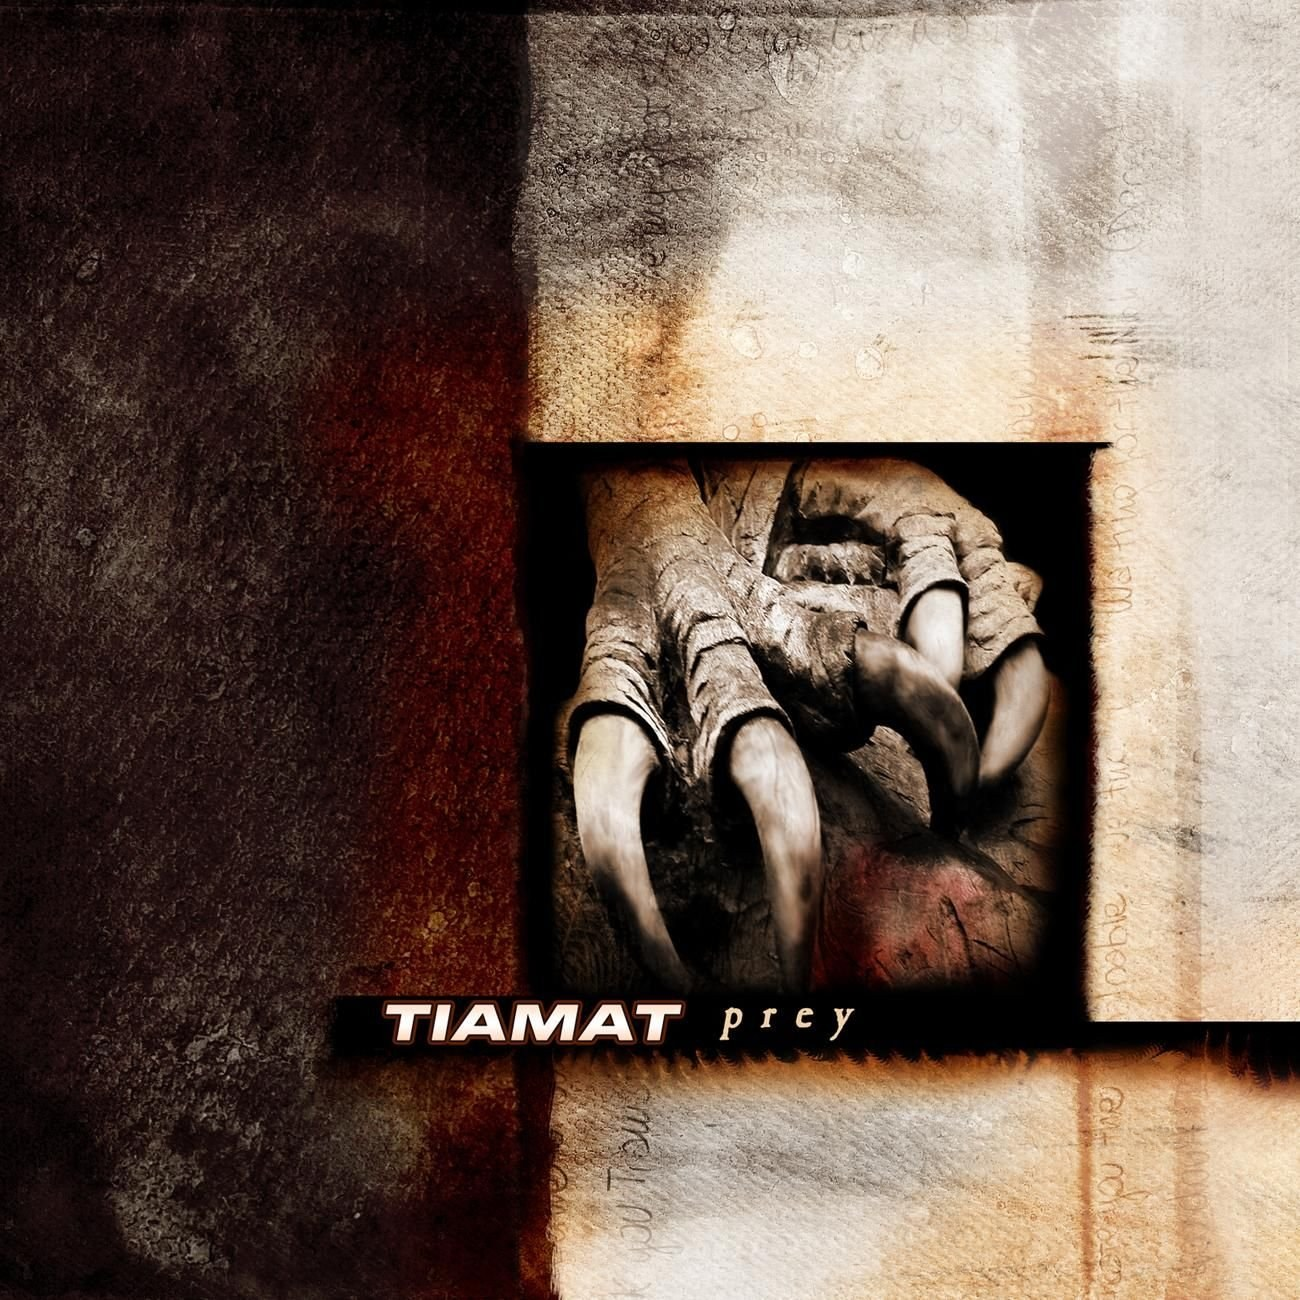 Reviews for Tiamat - Prey